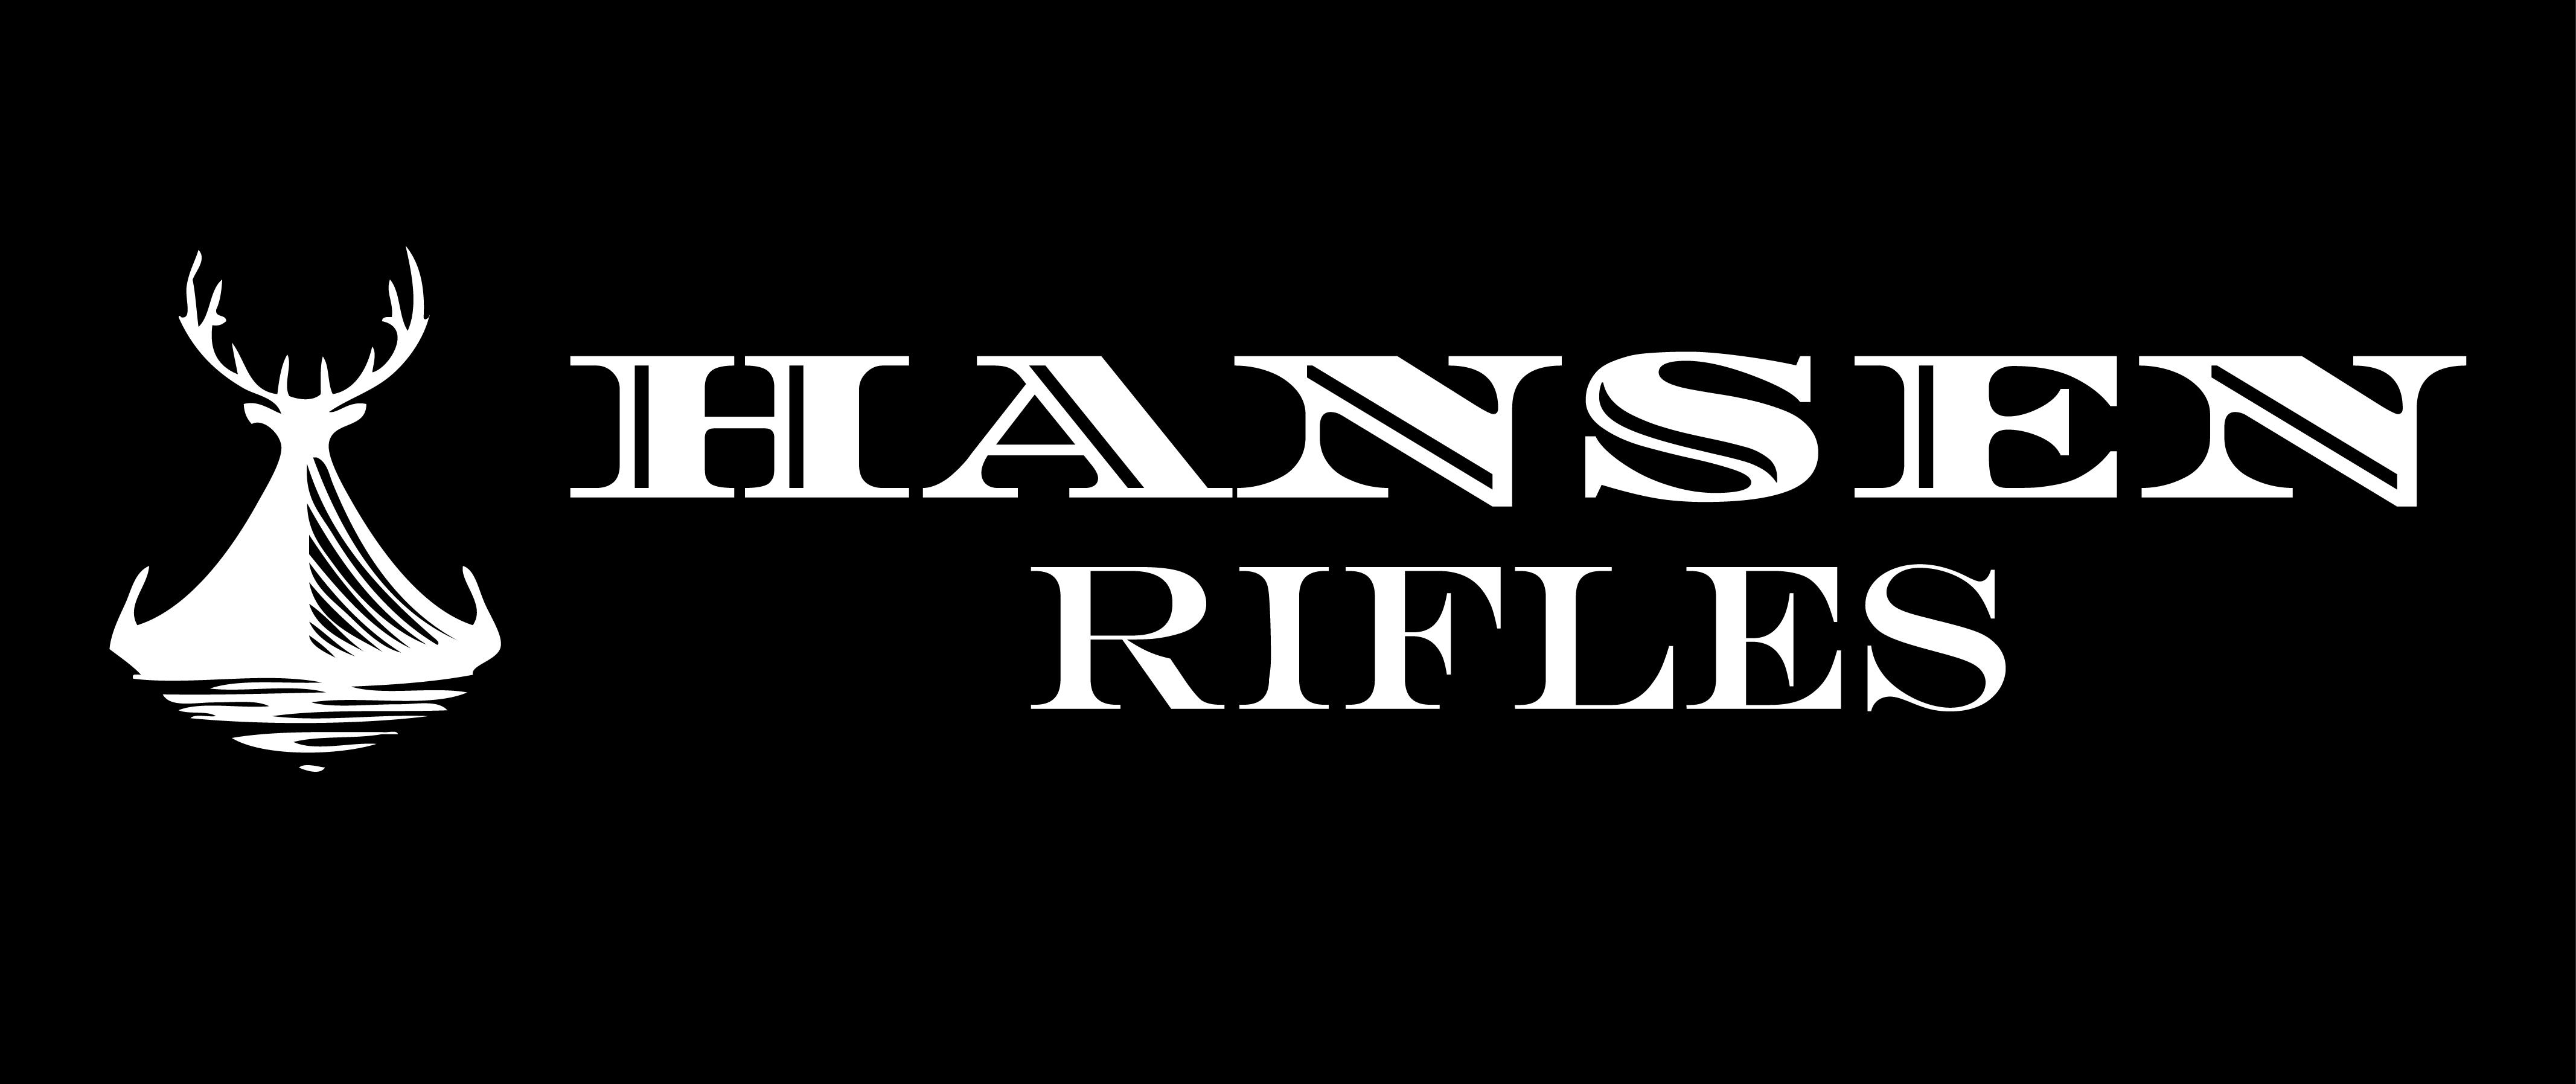 Hansen rifles